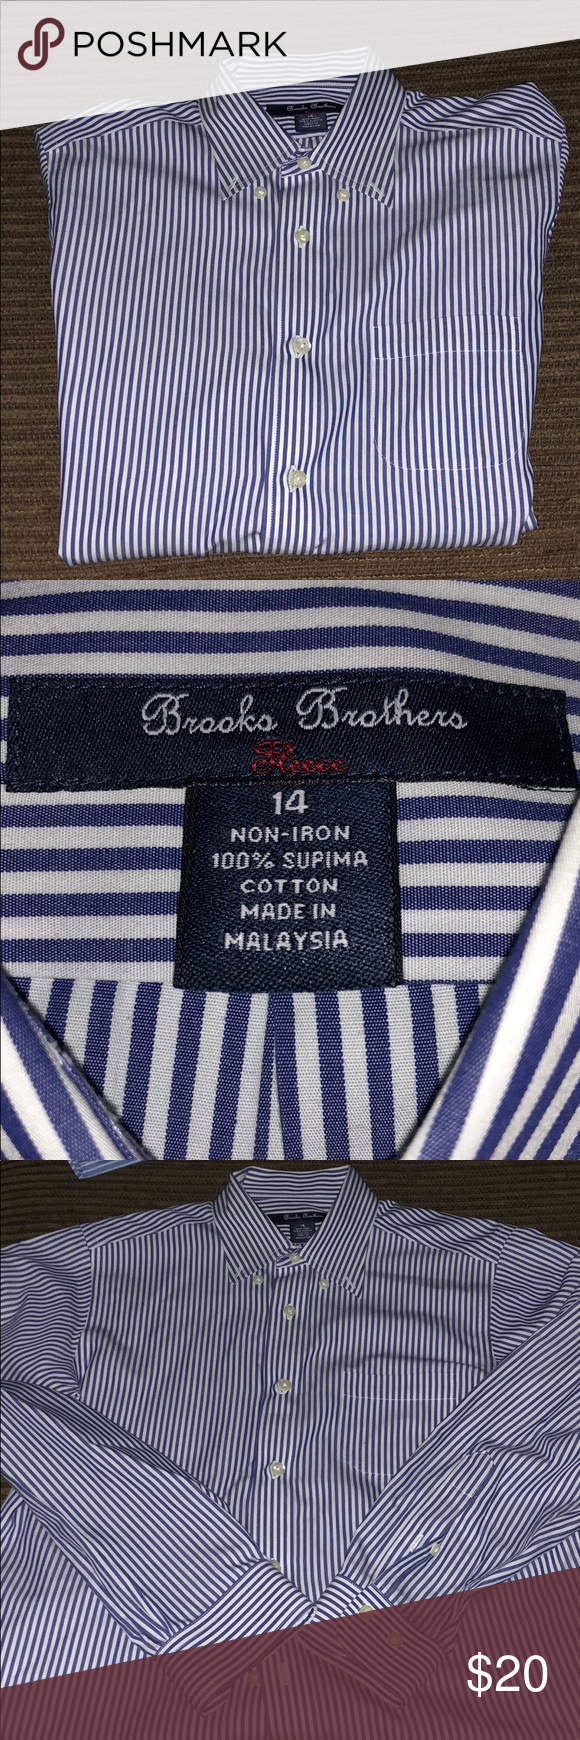 Brooks Brothers Boys Dress Shirt In 2018 My Posh Closet